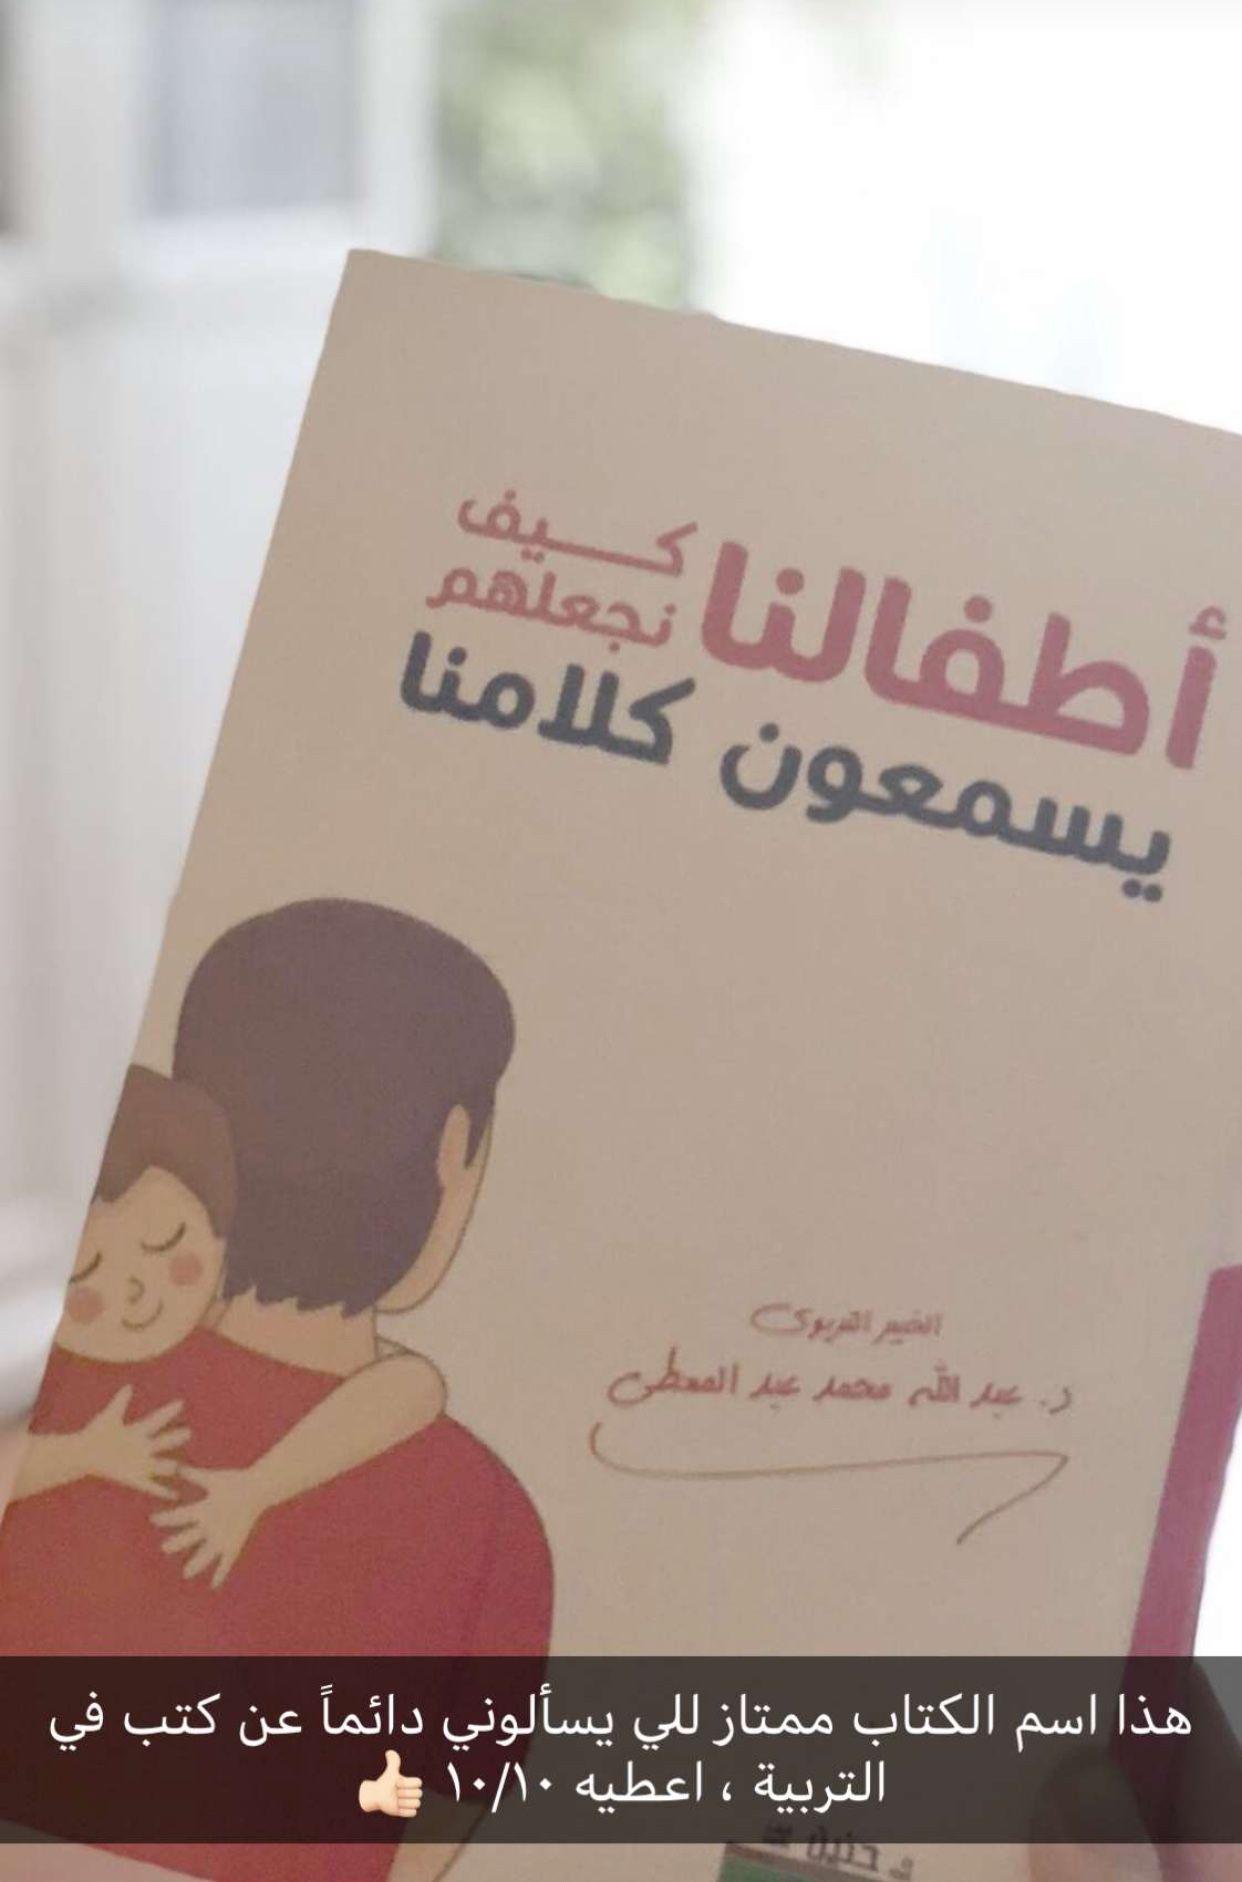 Pin By Walaa Farouq On Books كتب Inspirational Books Ebooks Free Books Book Club Books